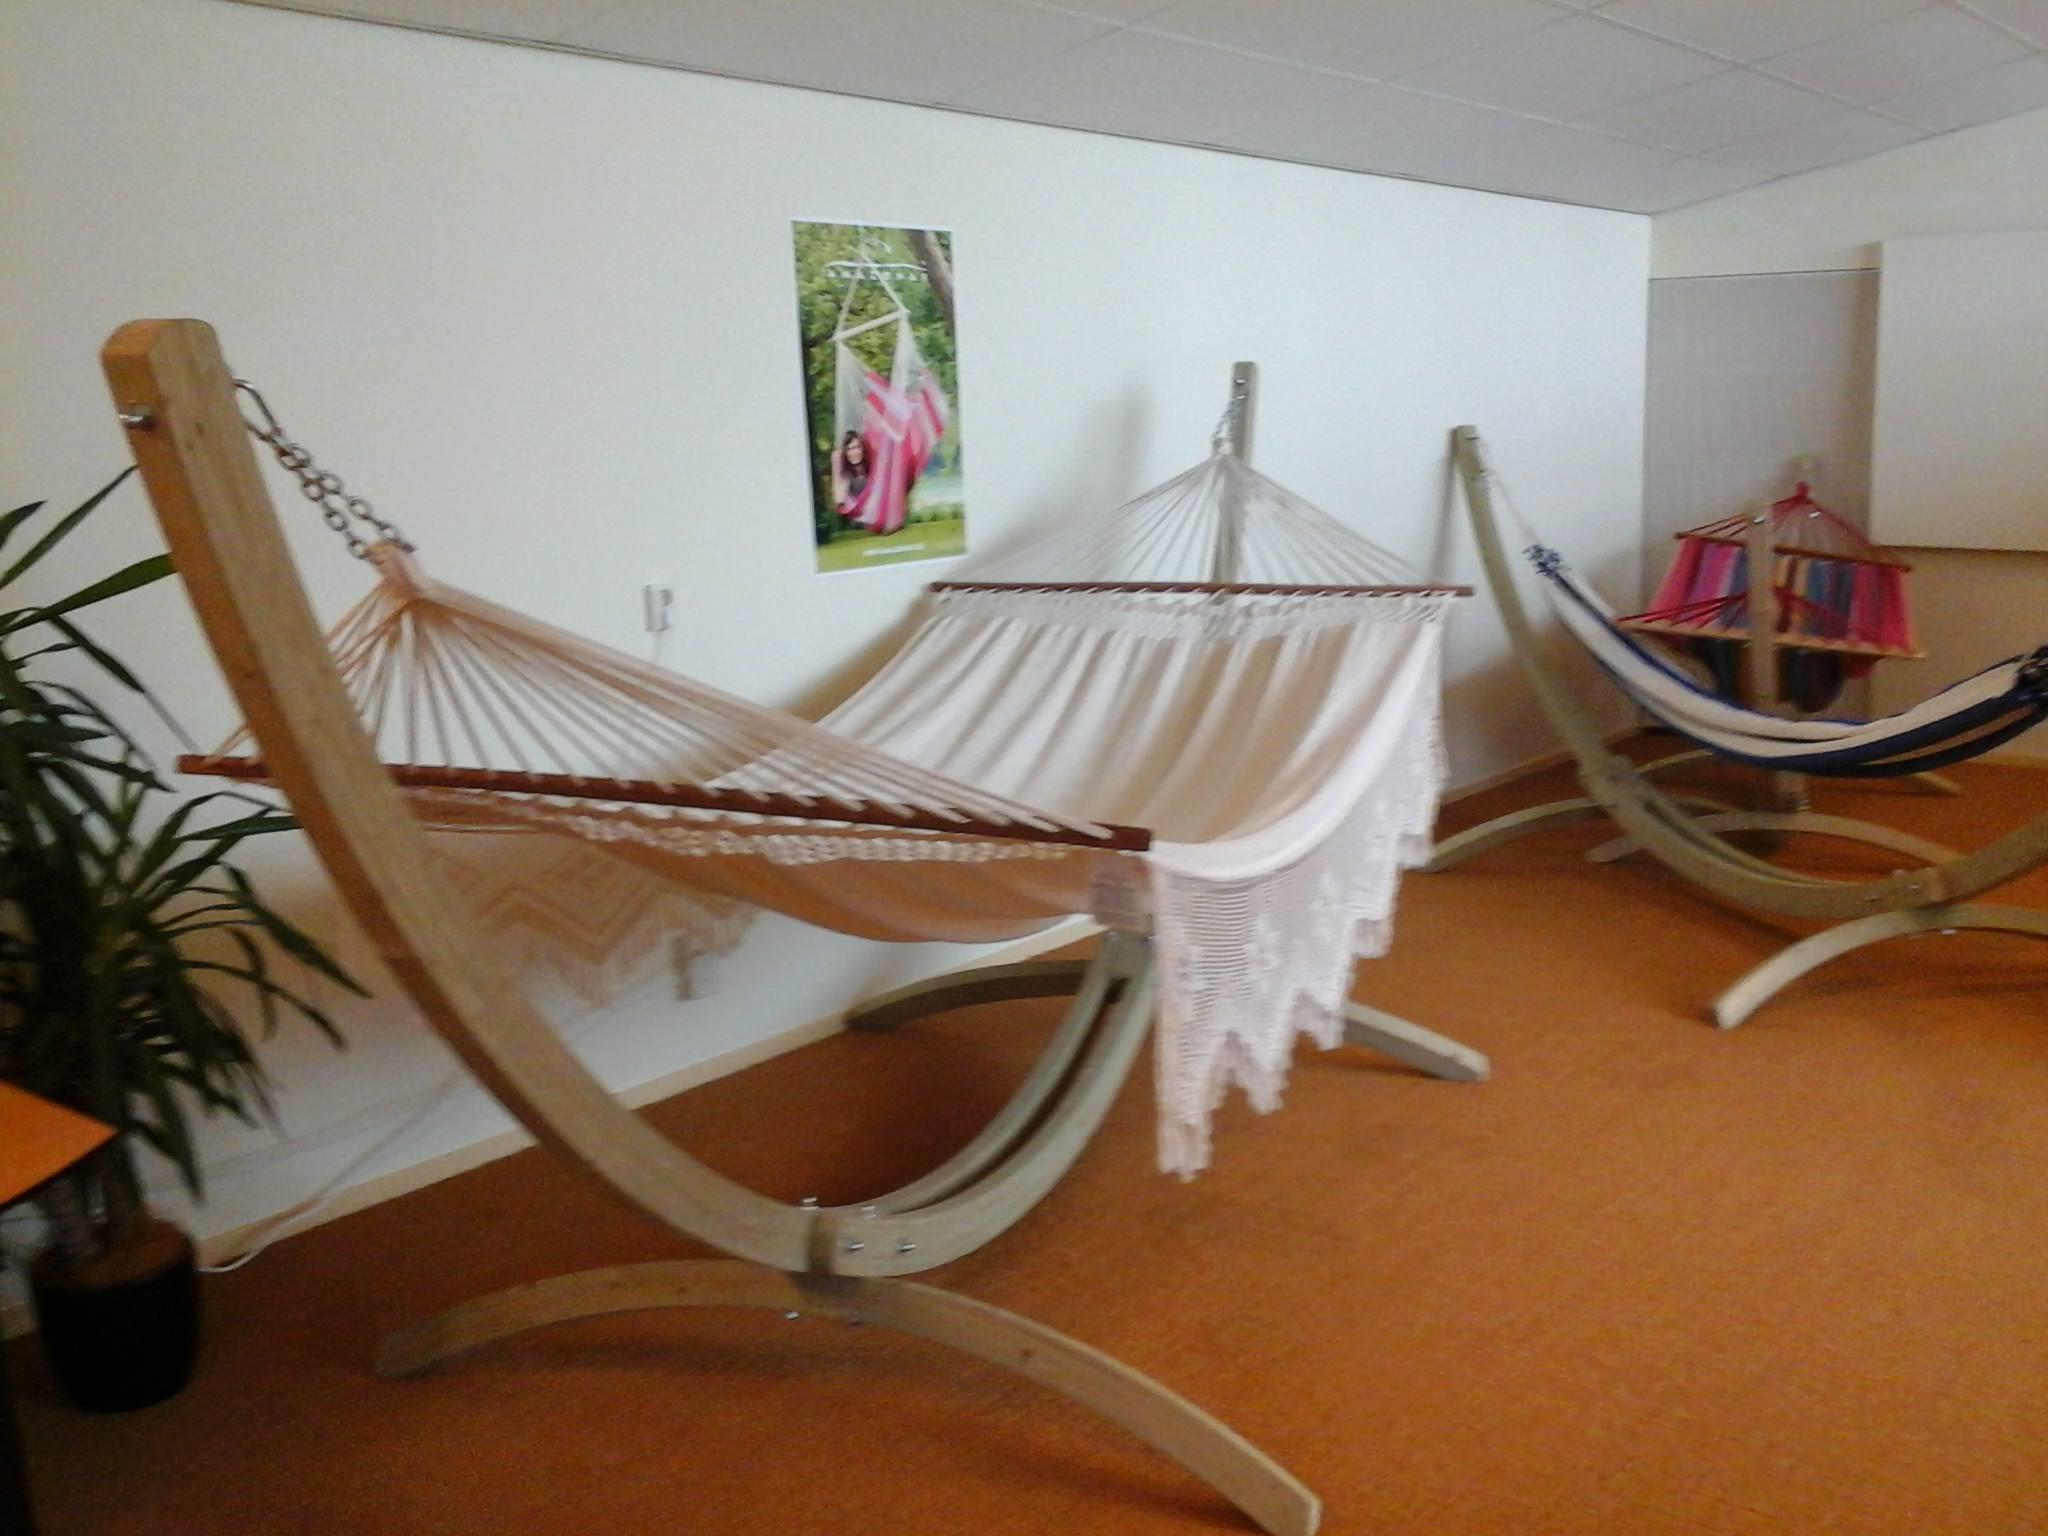 Hangmatstandaard Familie 'Wood' Retour artikel